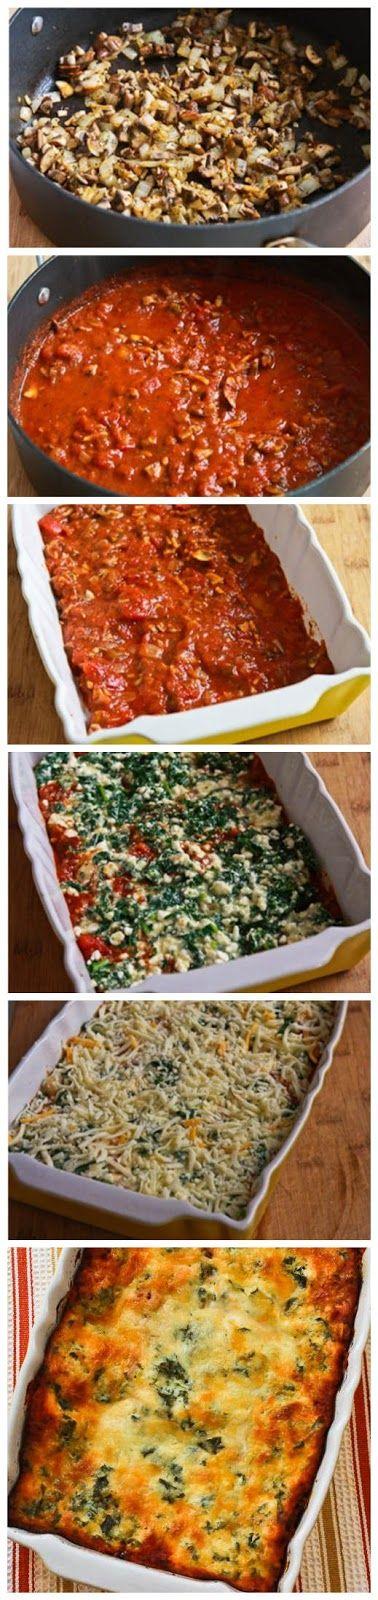 Vegetarian Lasagna with Kale and Mushroom-Tomato Sauce